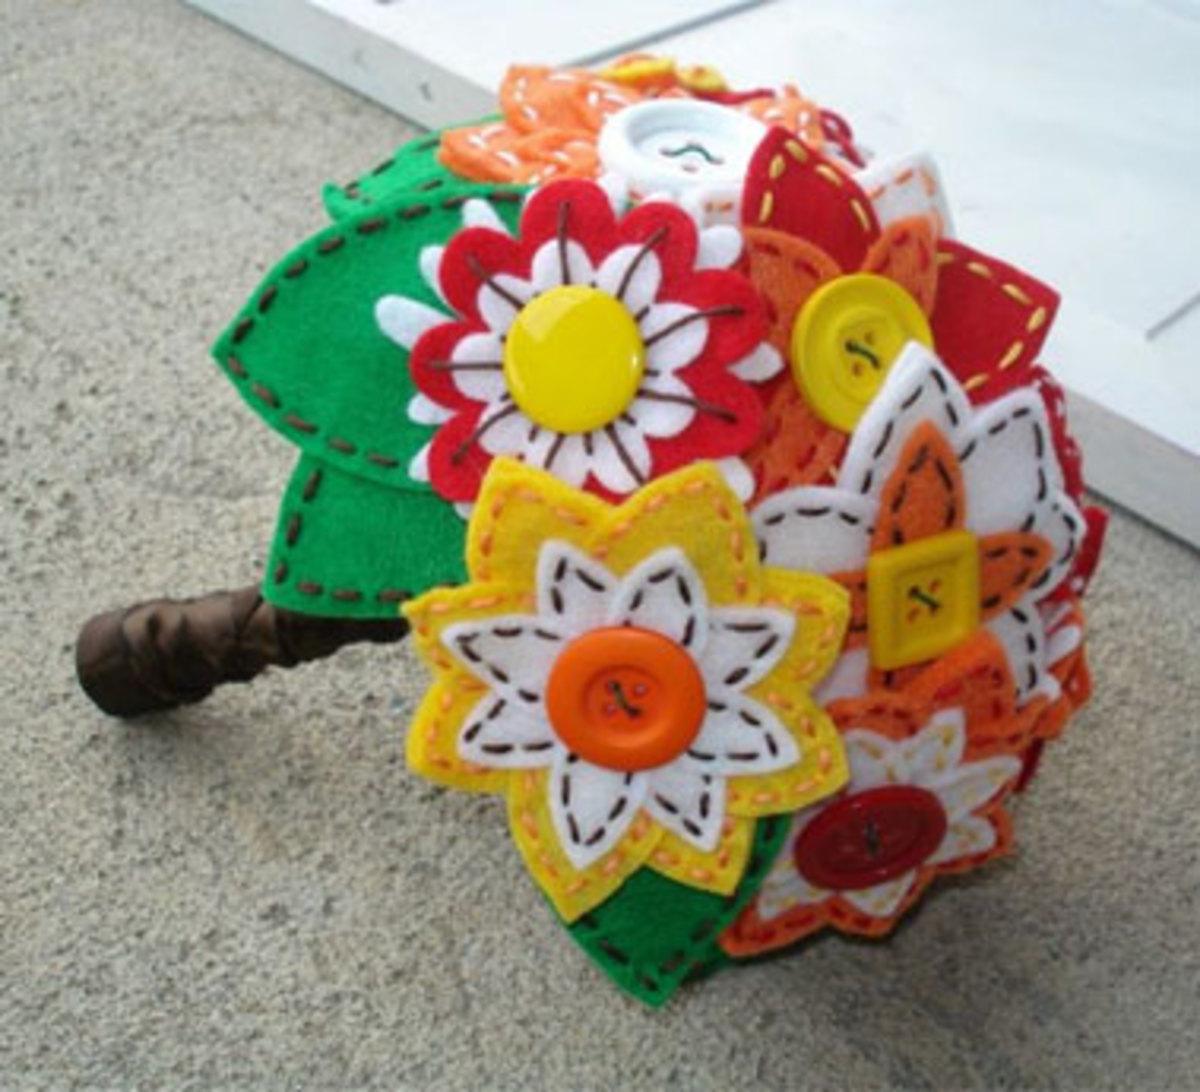 A felt and button bouquet + indie pop vows = perfect alternative wedding!